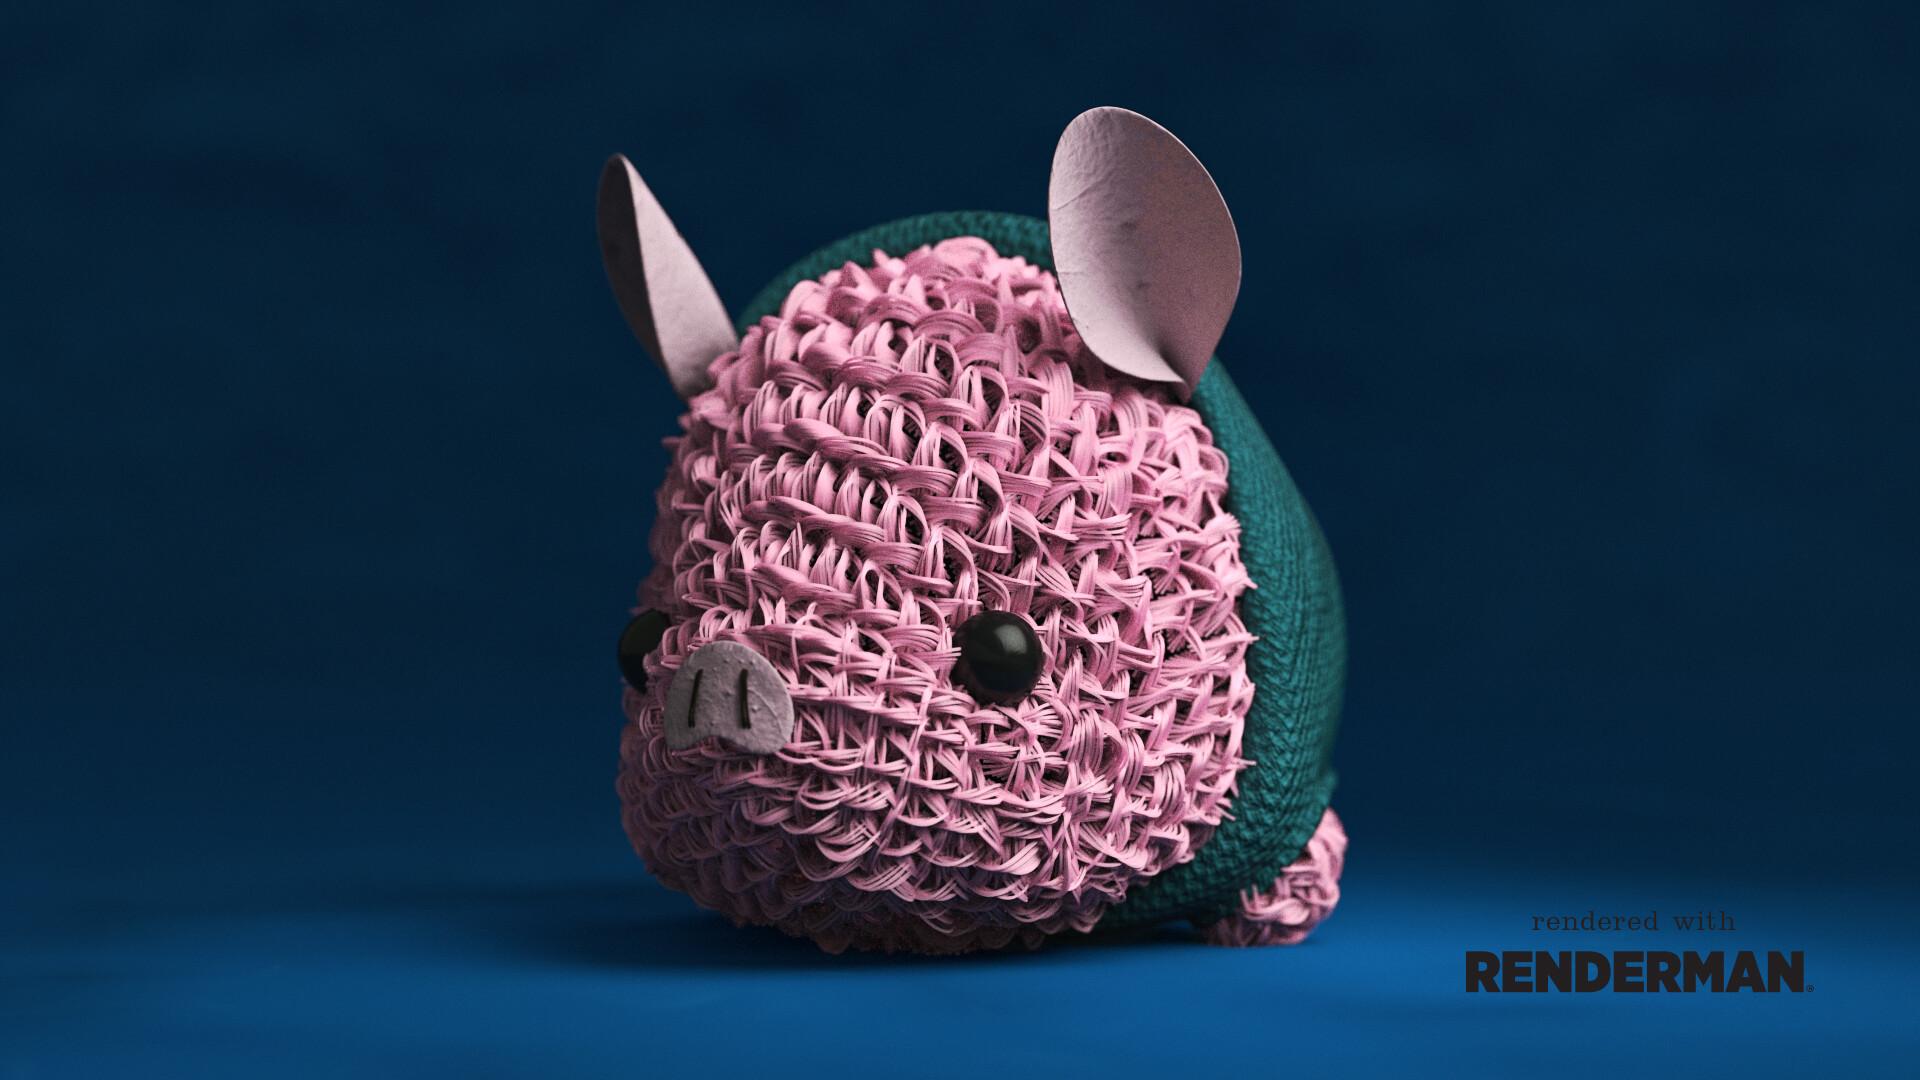 HD wallpaper: amigurumi, crochet, squirrel, screen, hand labor ... | 1080x1920